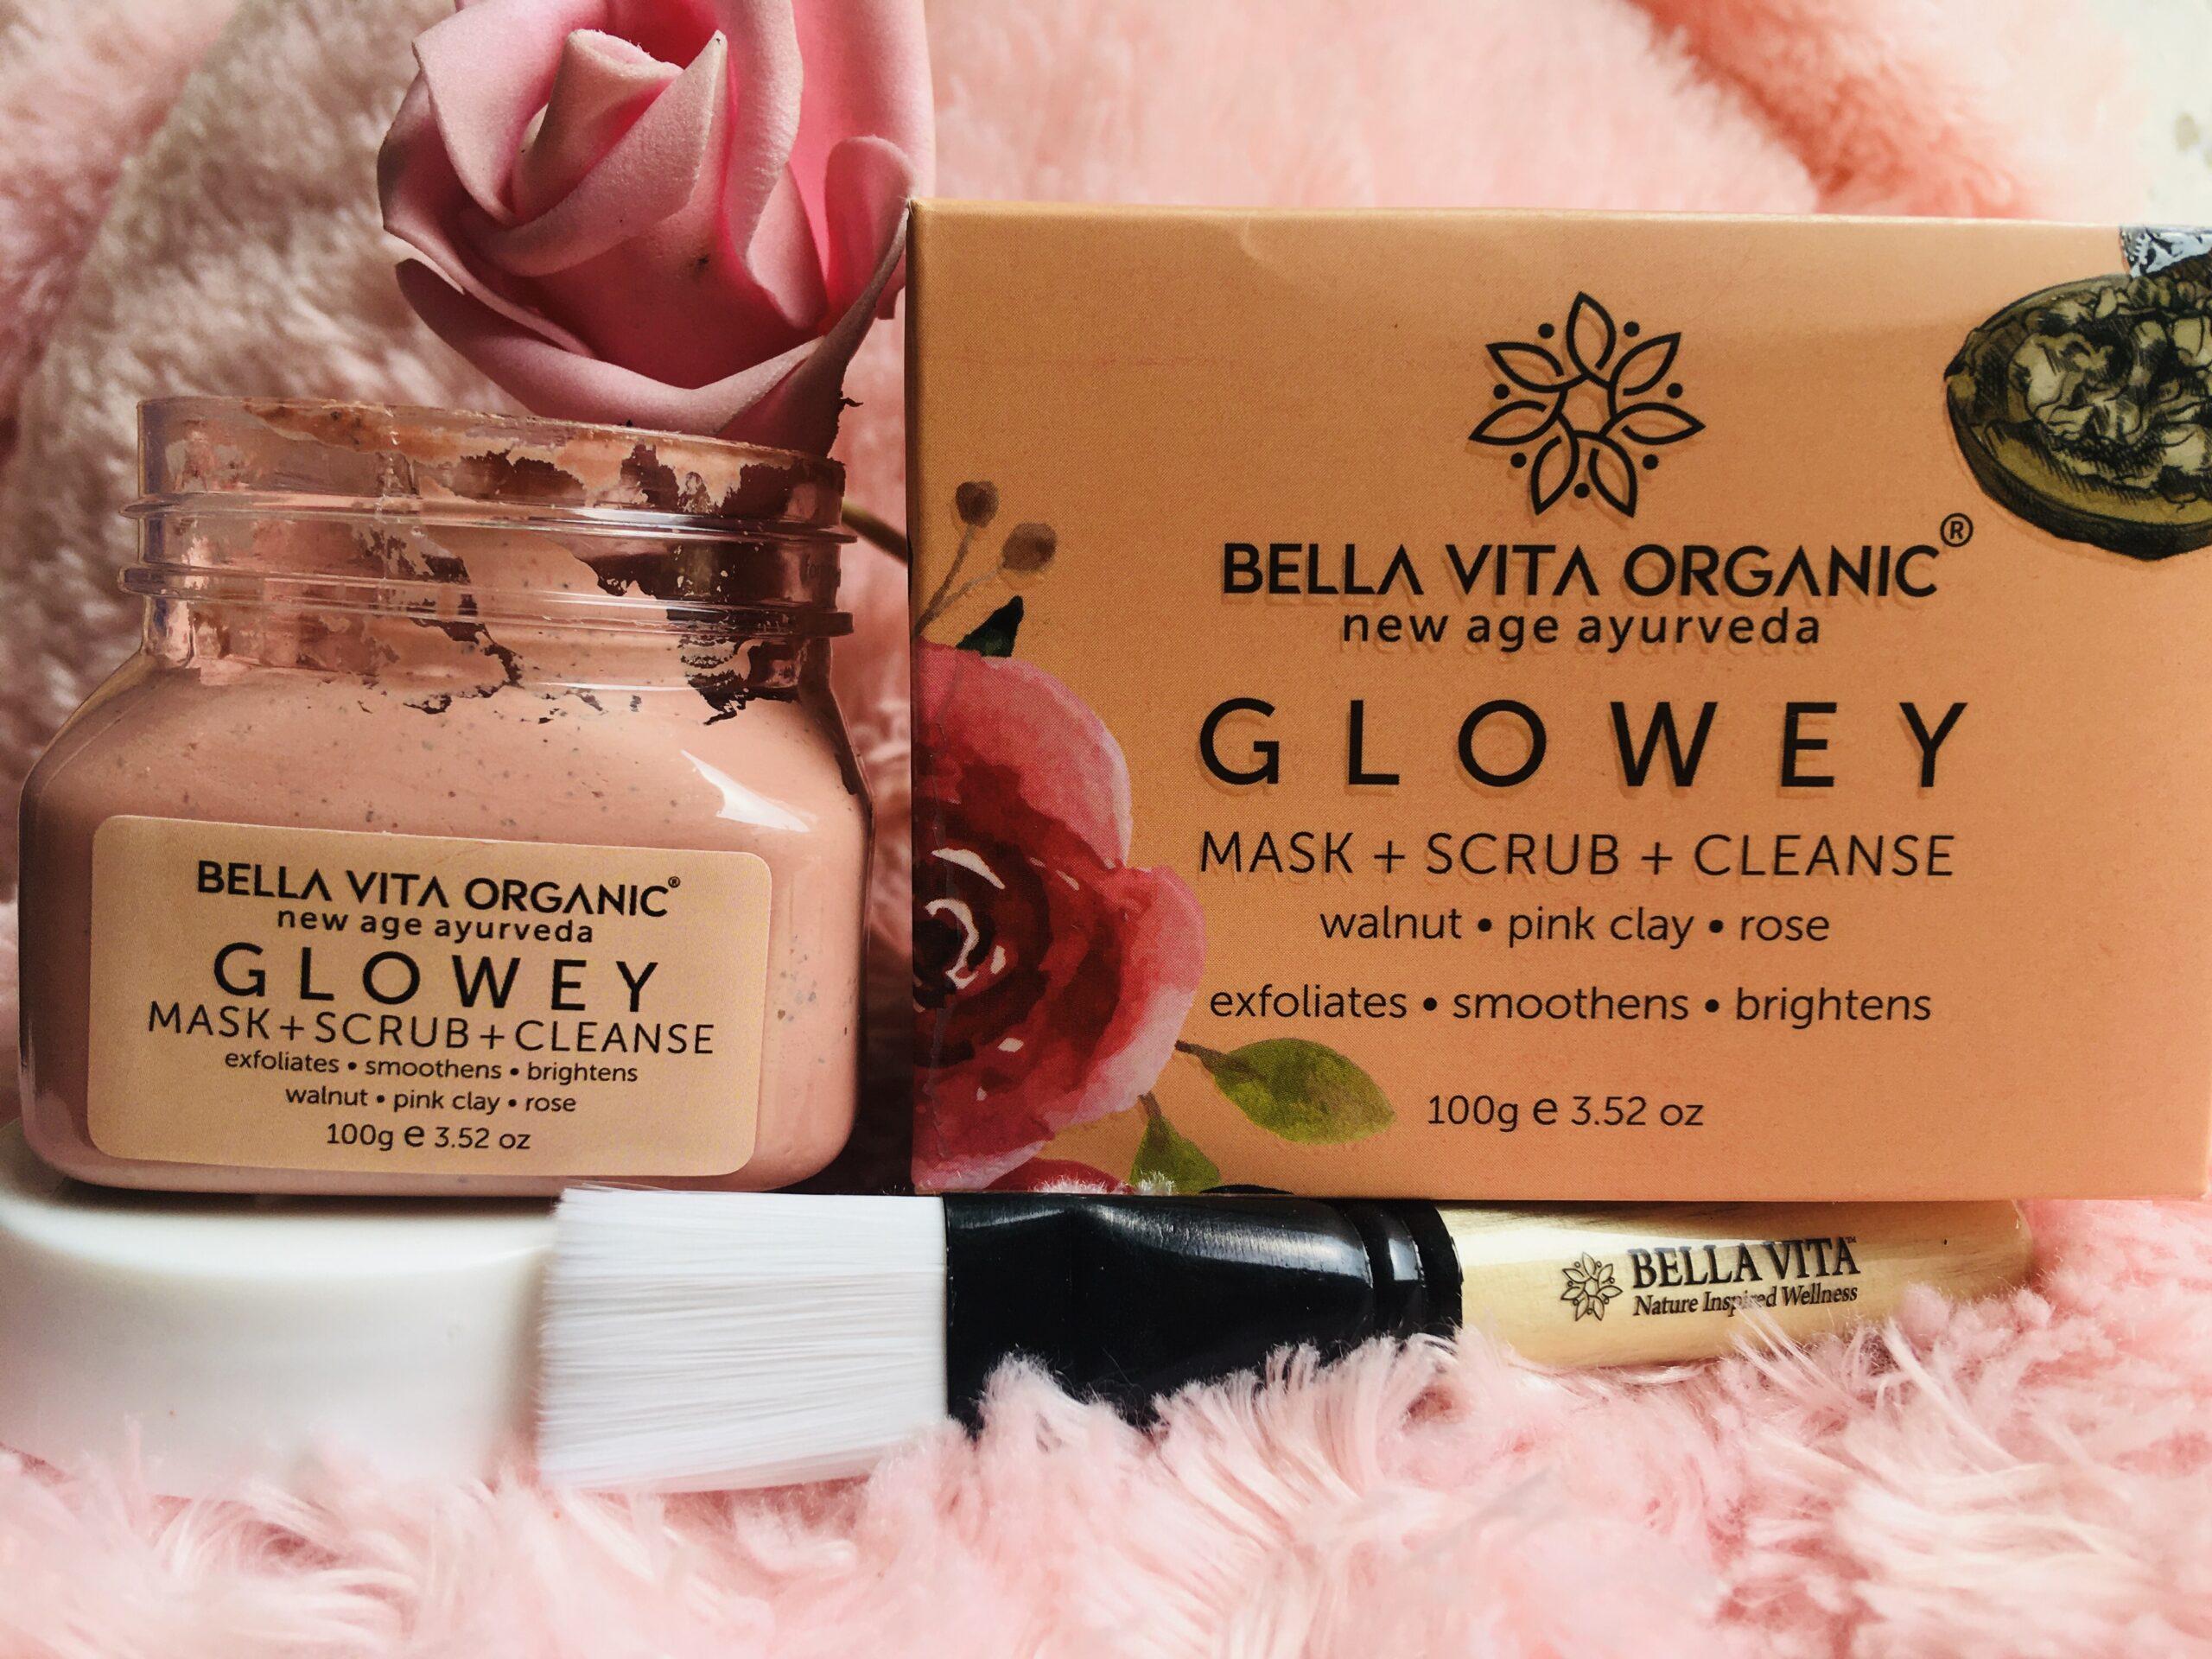 Bella Vita Glowey Mask+Scrub+Cleanse Review